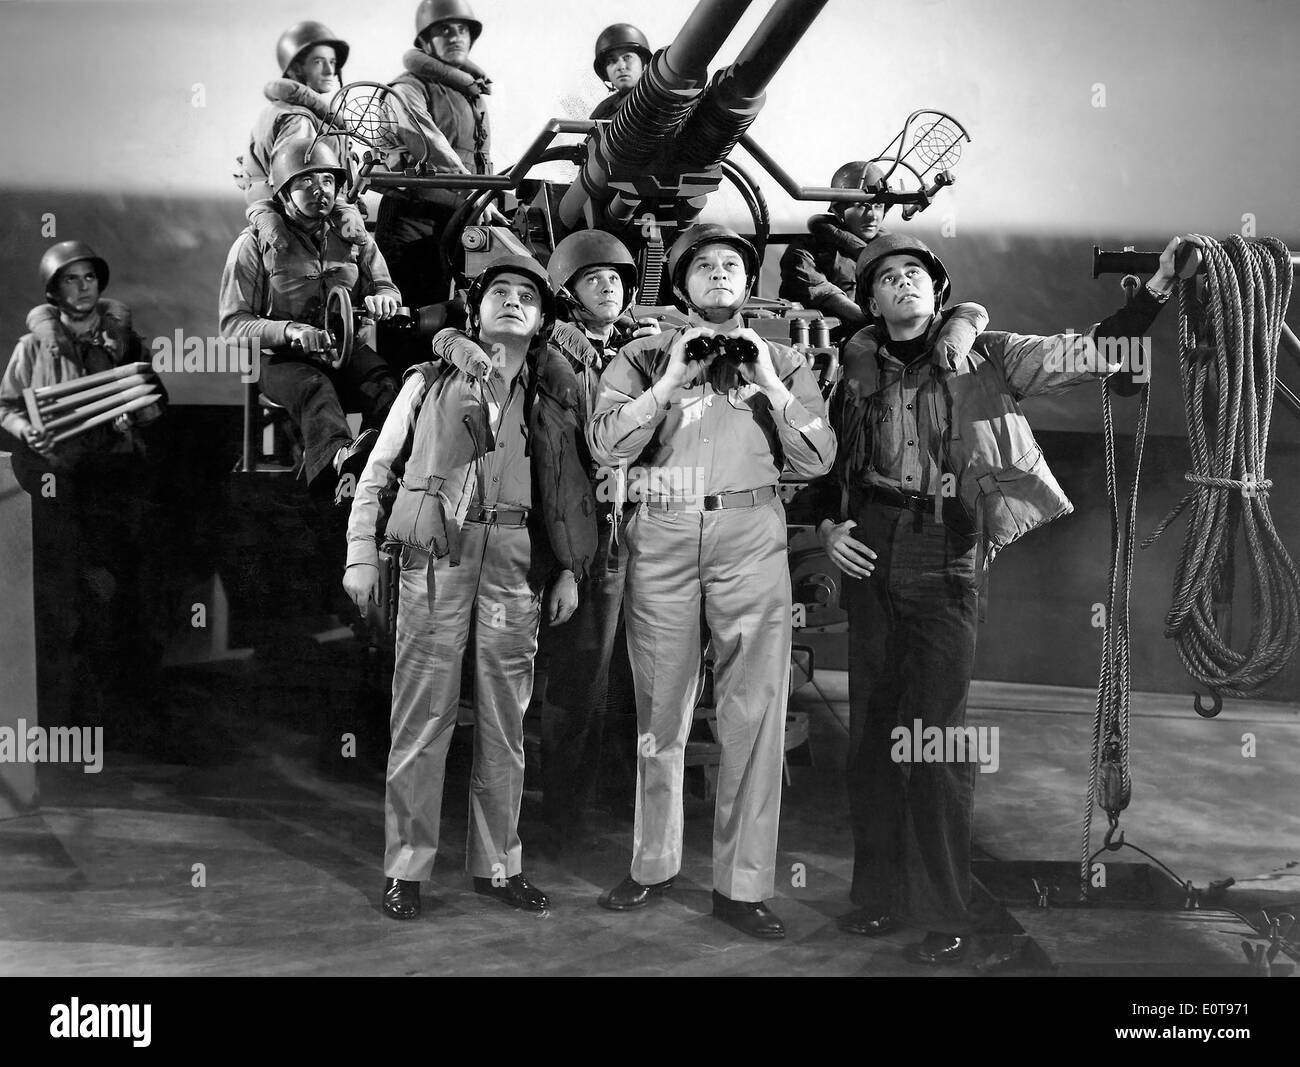 Edward G. Robinson, (left), Glenn Ford, (right), on-set of the Film, 'Destroyer', 1943 - Stock Image